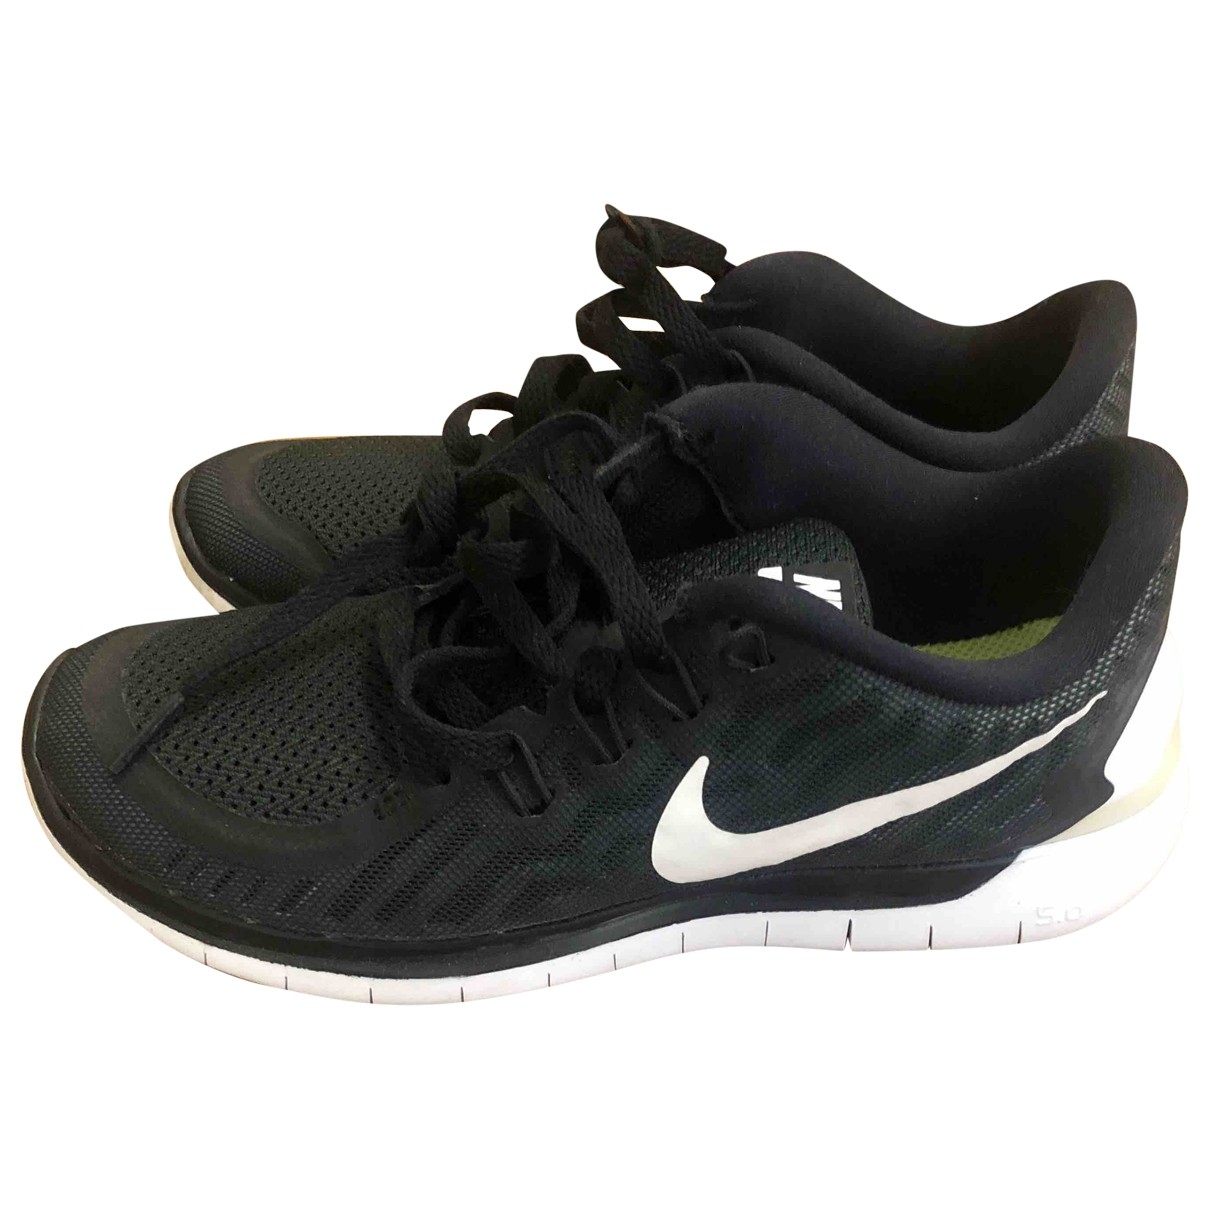 Nike - Baskets Free Run pour femme en toile - noir